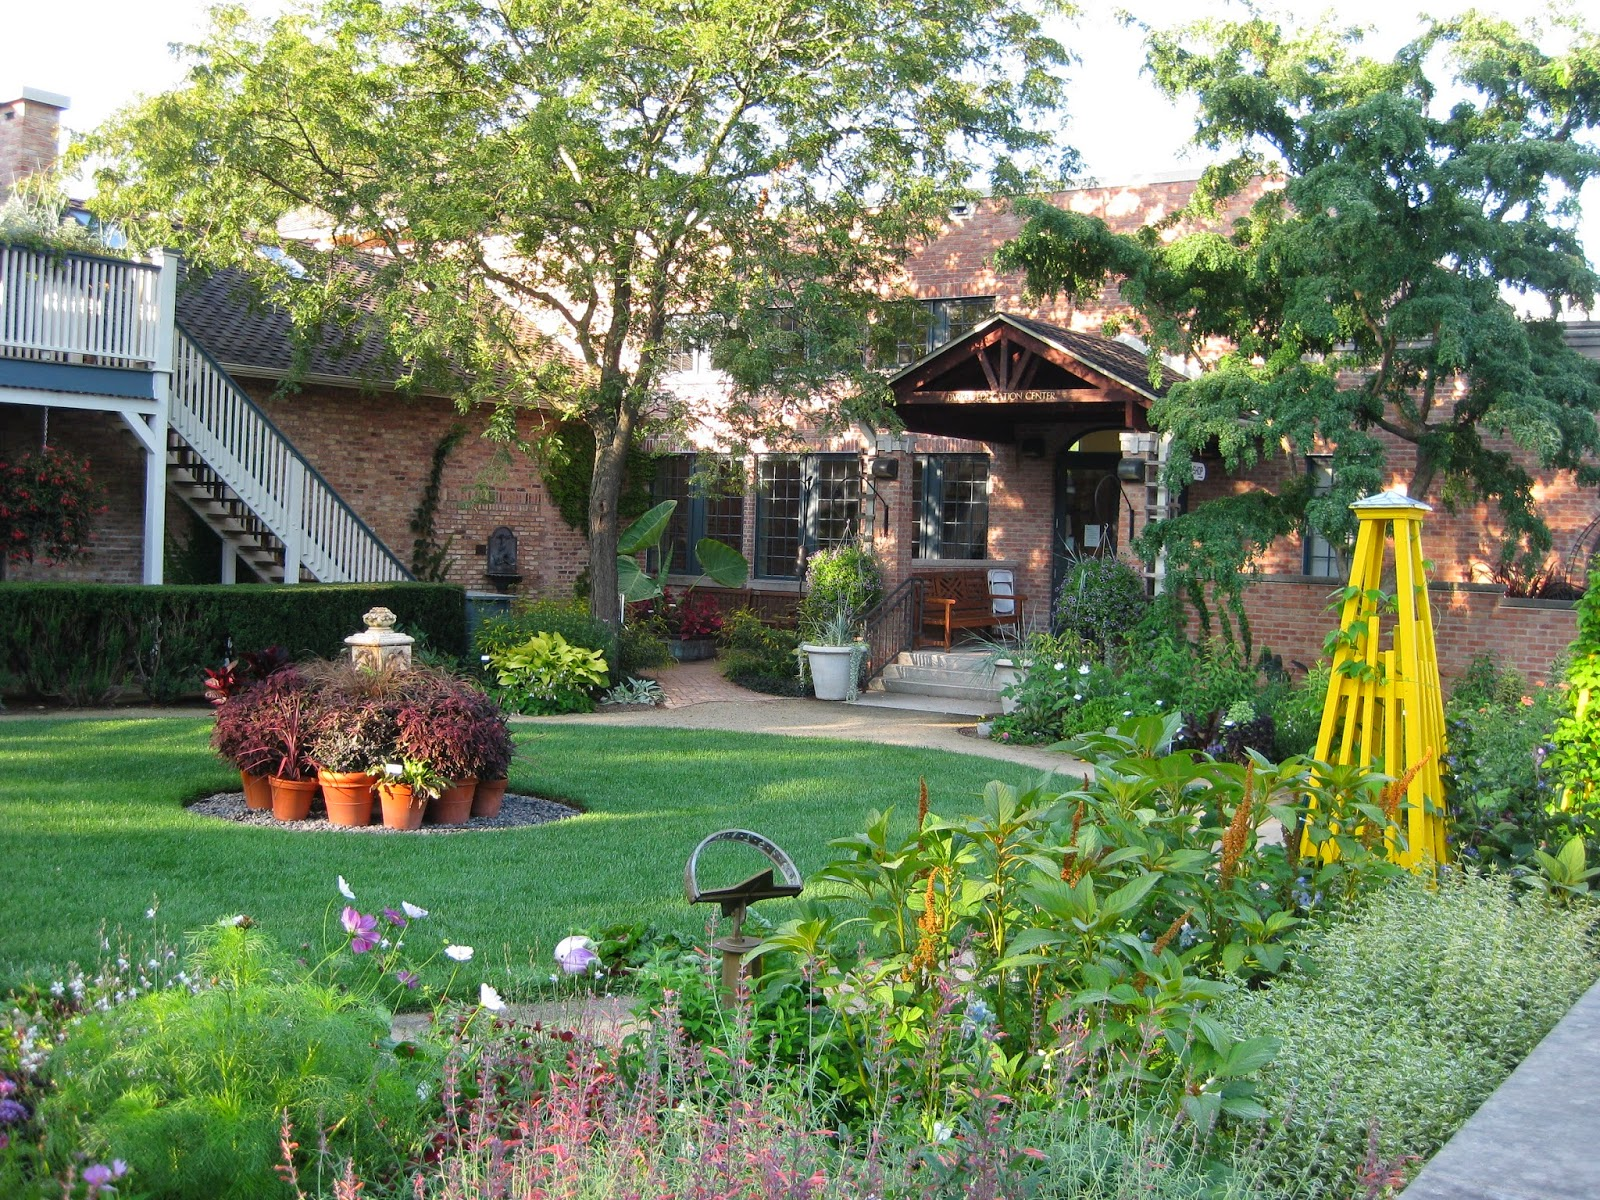 English Cottage Garden - Rotary Botanical Gardens